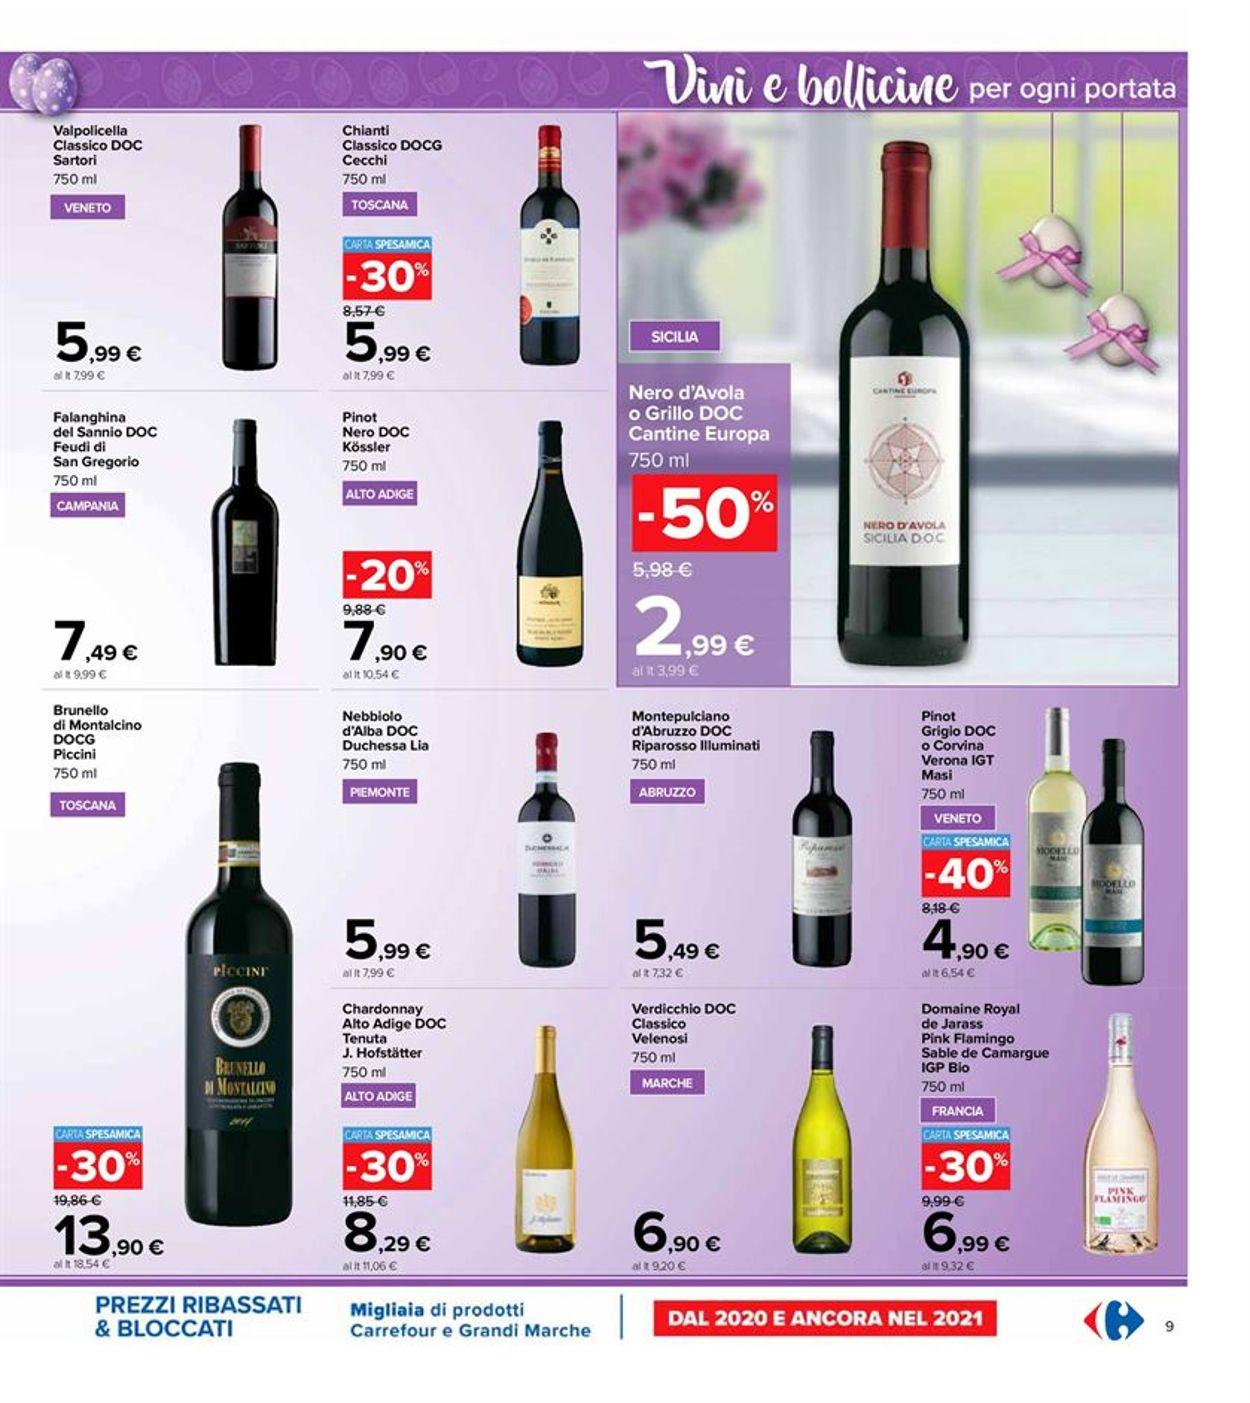 Volantino Carrefour - Pasqua 2021! - Offerte 22/03-05/04/2021 (Pagina 9)